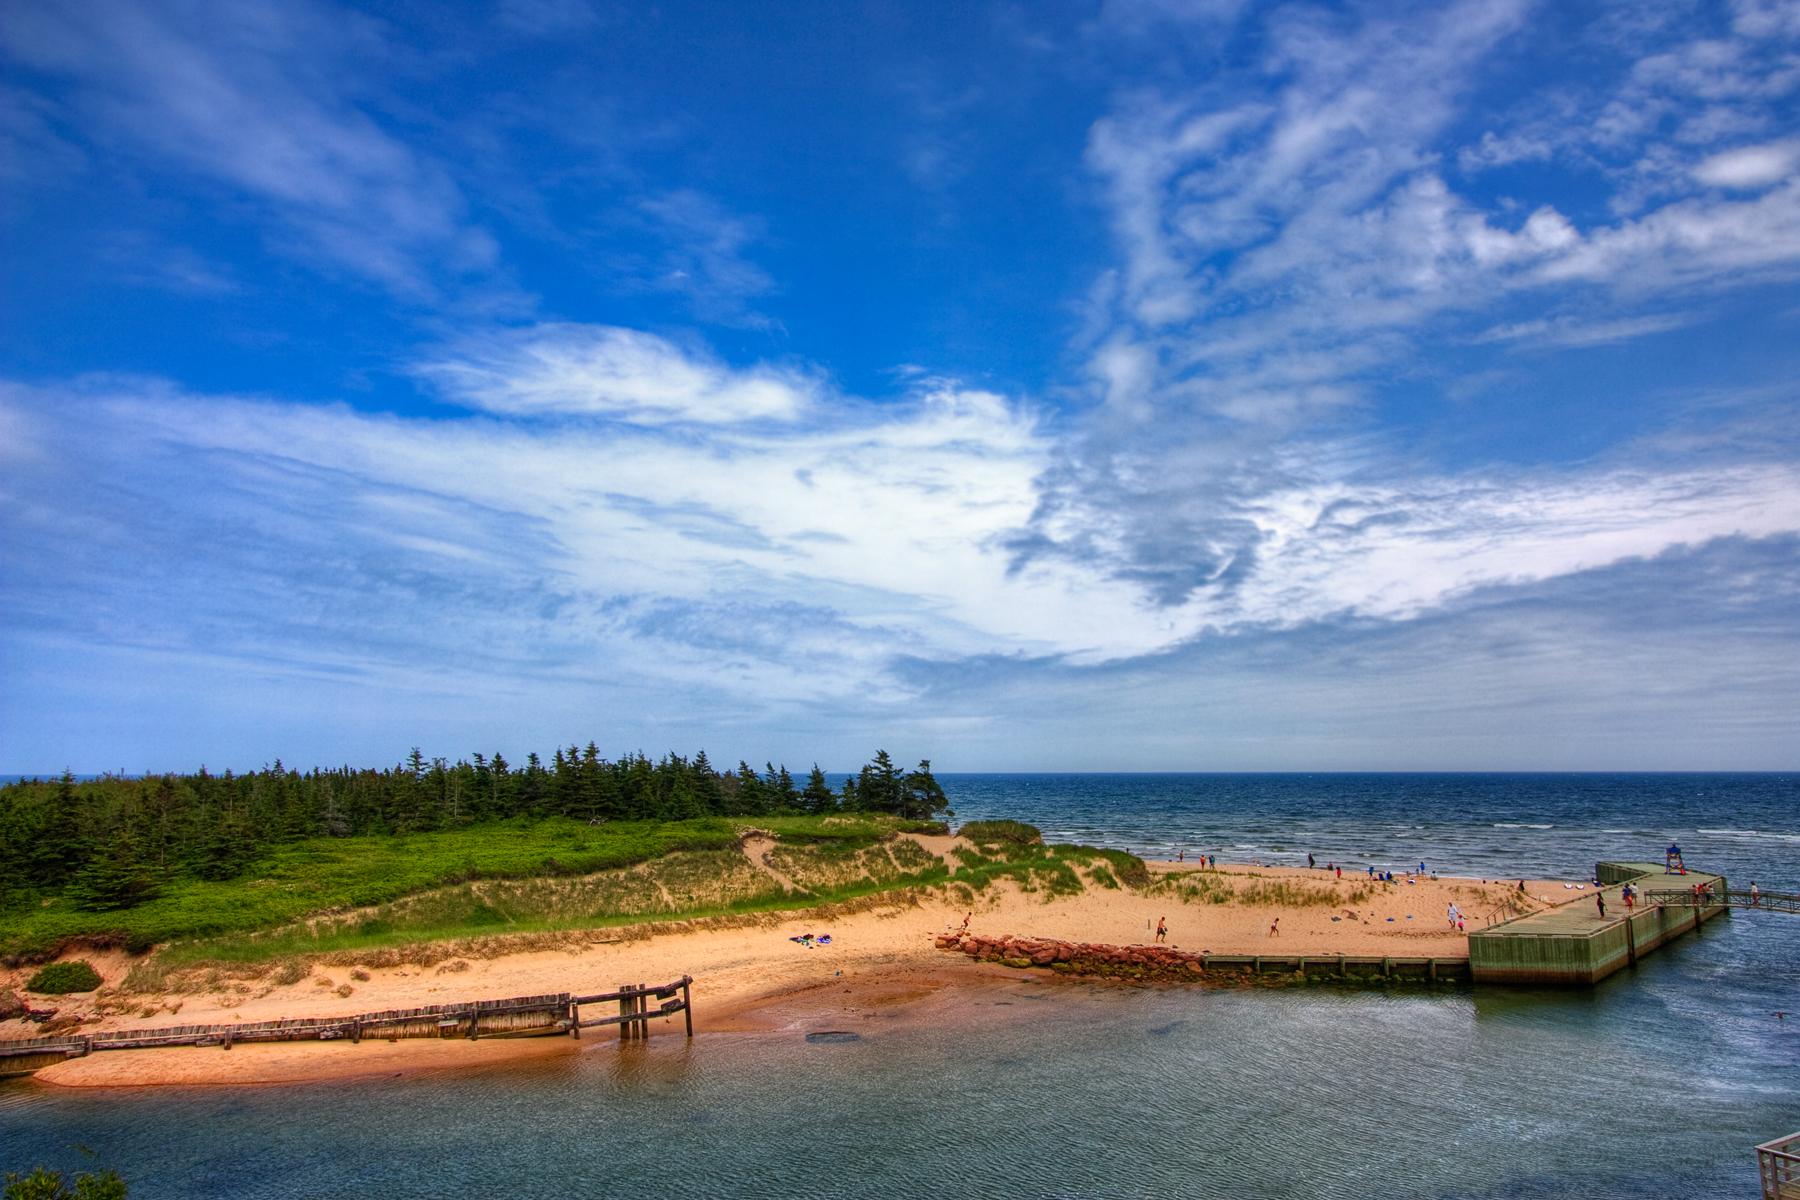 Pei beach scenery - hdr photo